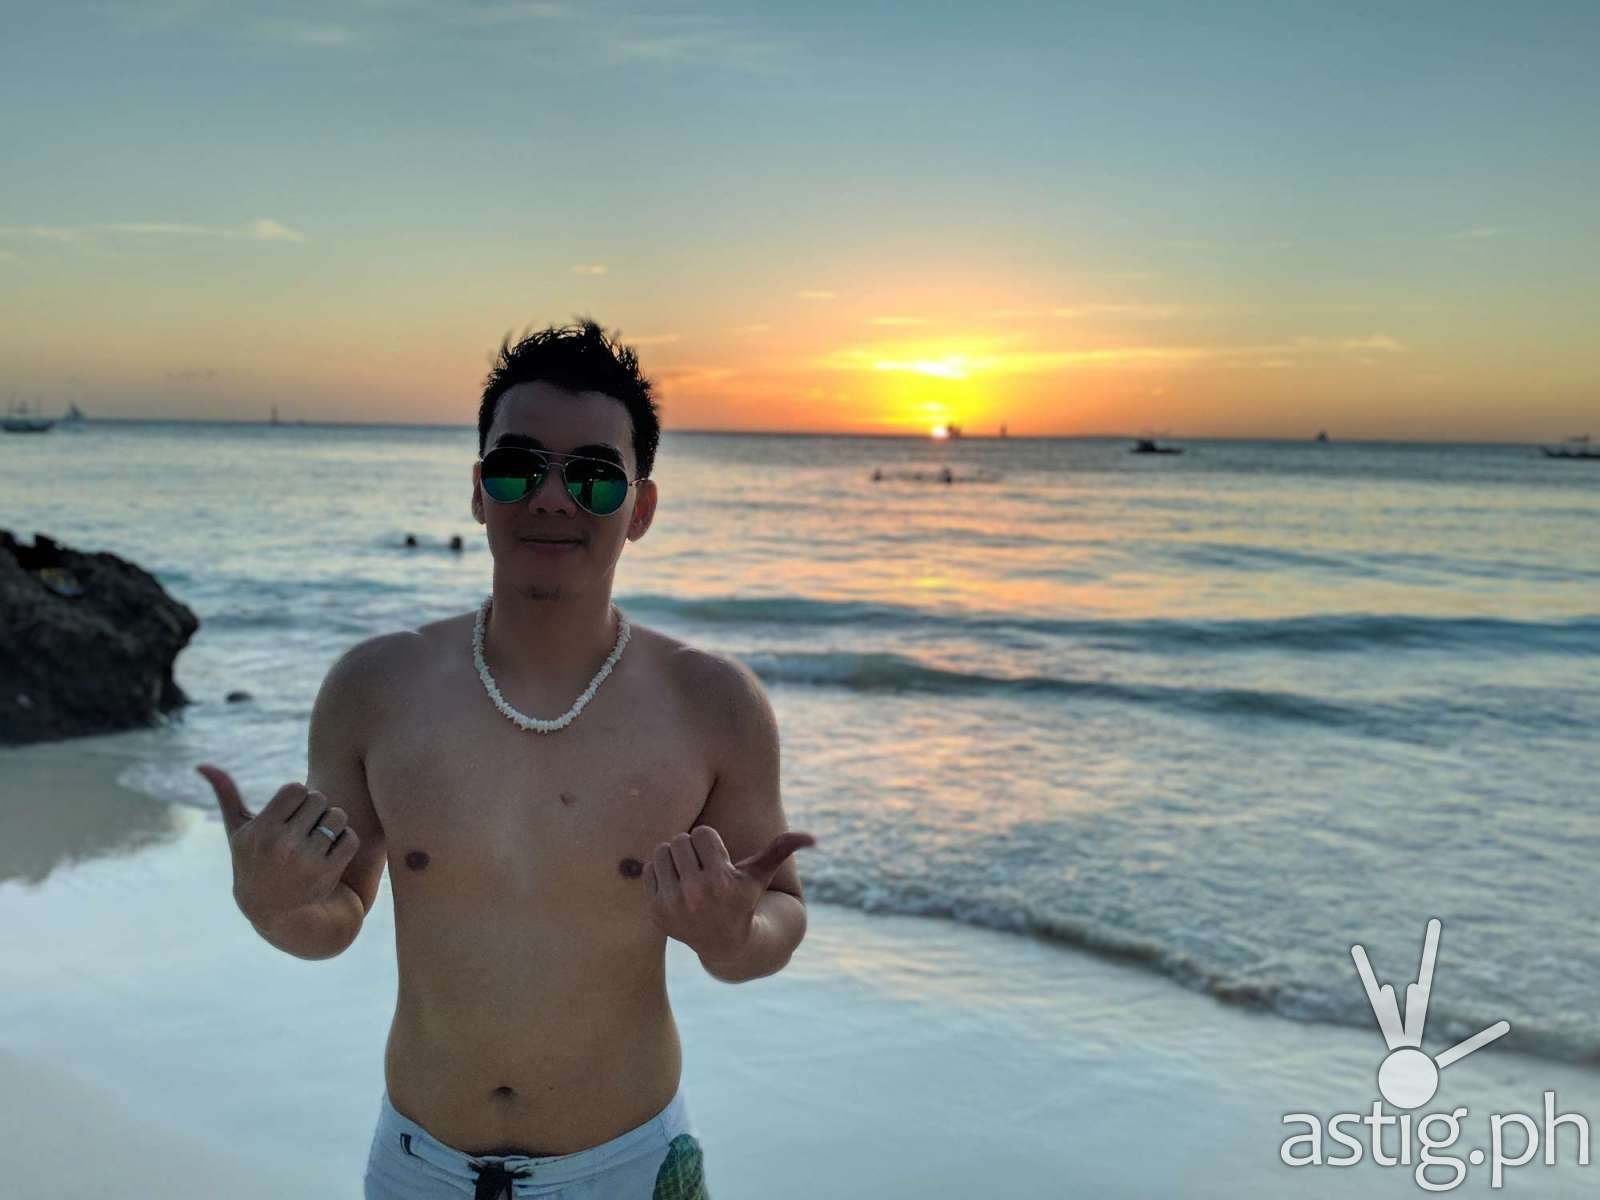 Sunset - Boracay Philippines re-opening smartphone photo - ASUS ZenFone 5 by Den Uy of TechKuya